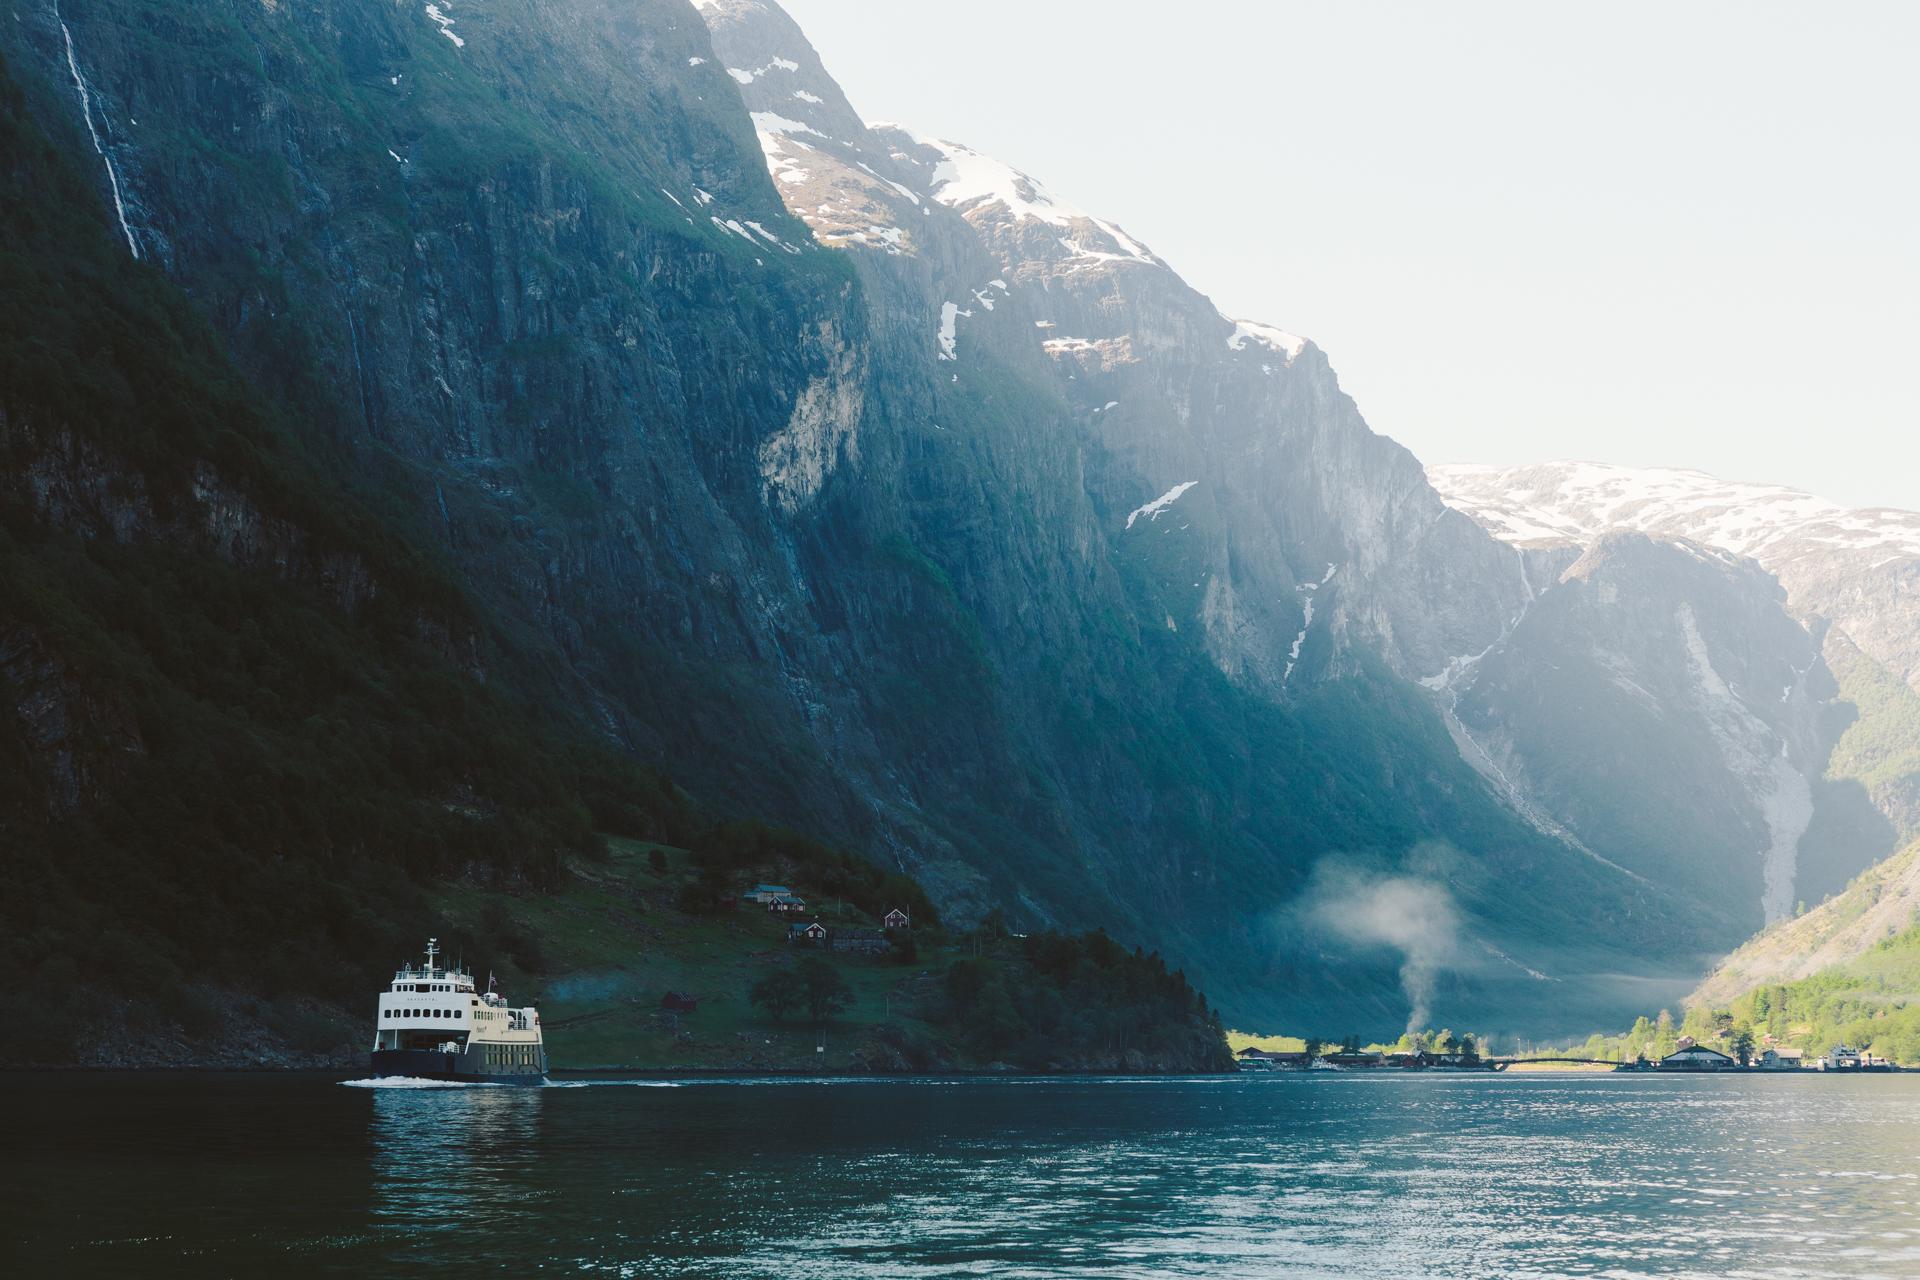 The car ferry  Skagastøl  heading towards Gudvangen